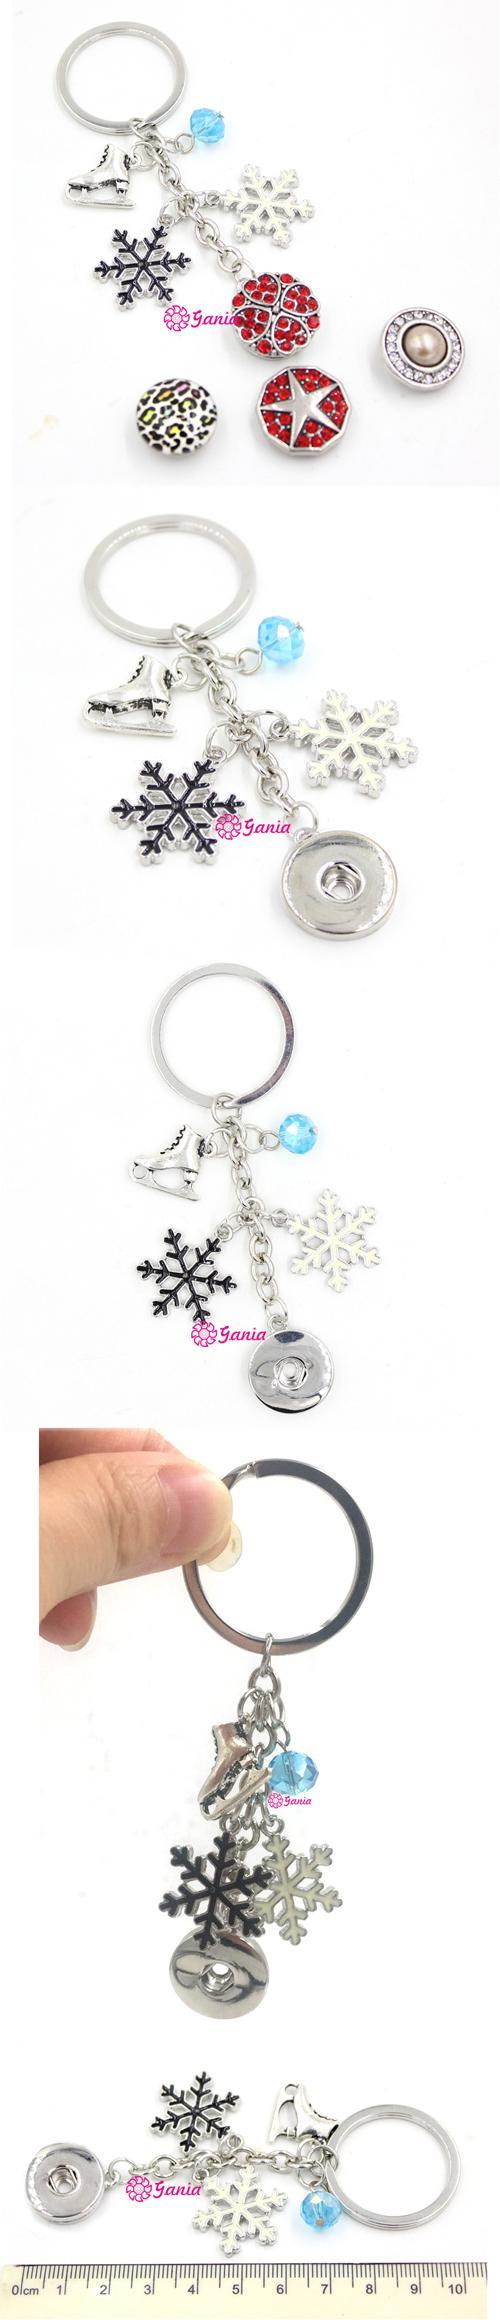 flocon de neige Patin à glace Keychain Porte-clés patin à glace charme Porte-clés hiver Bijoux